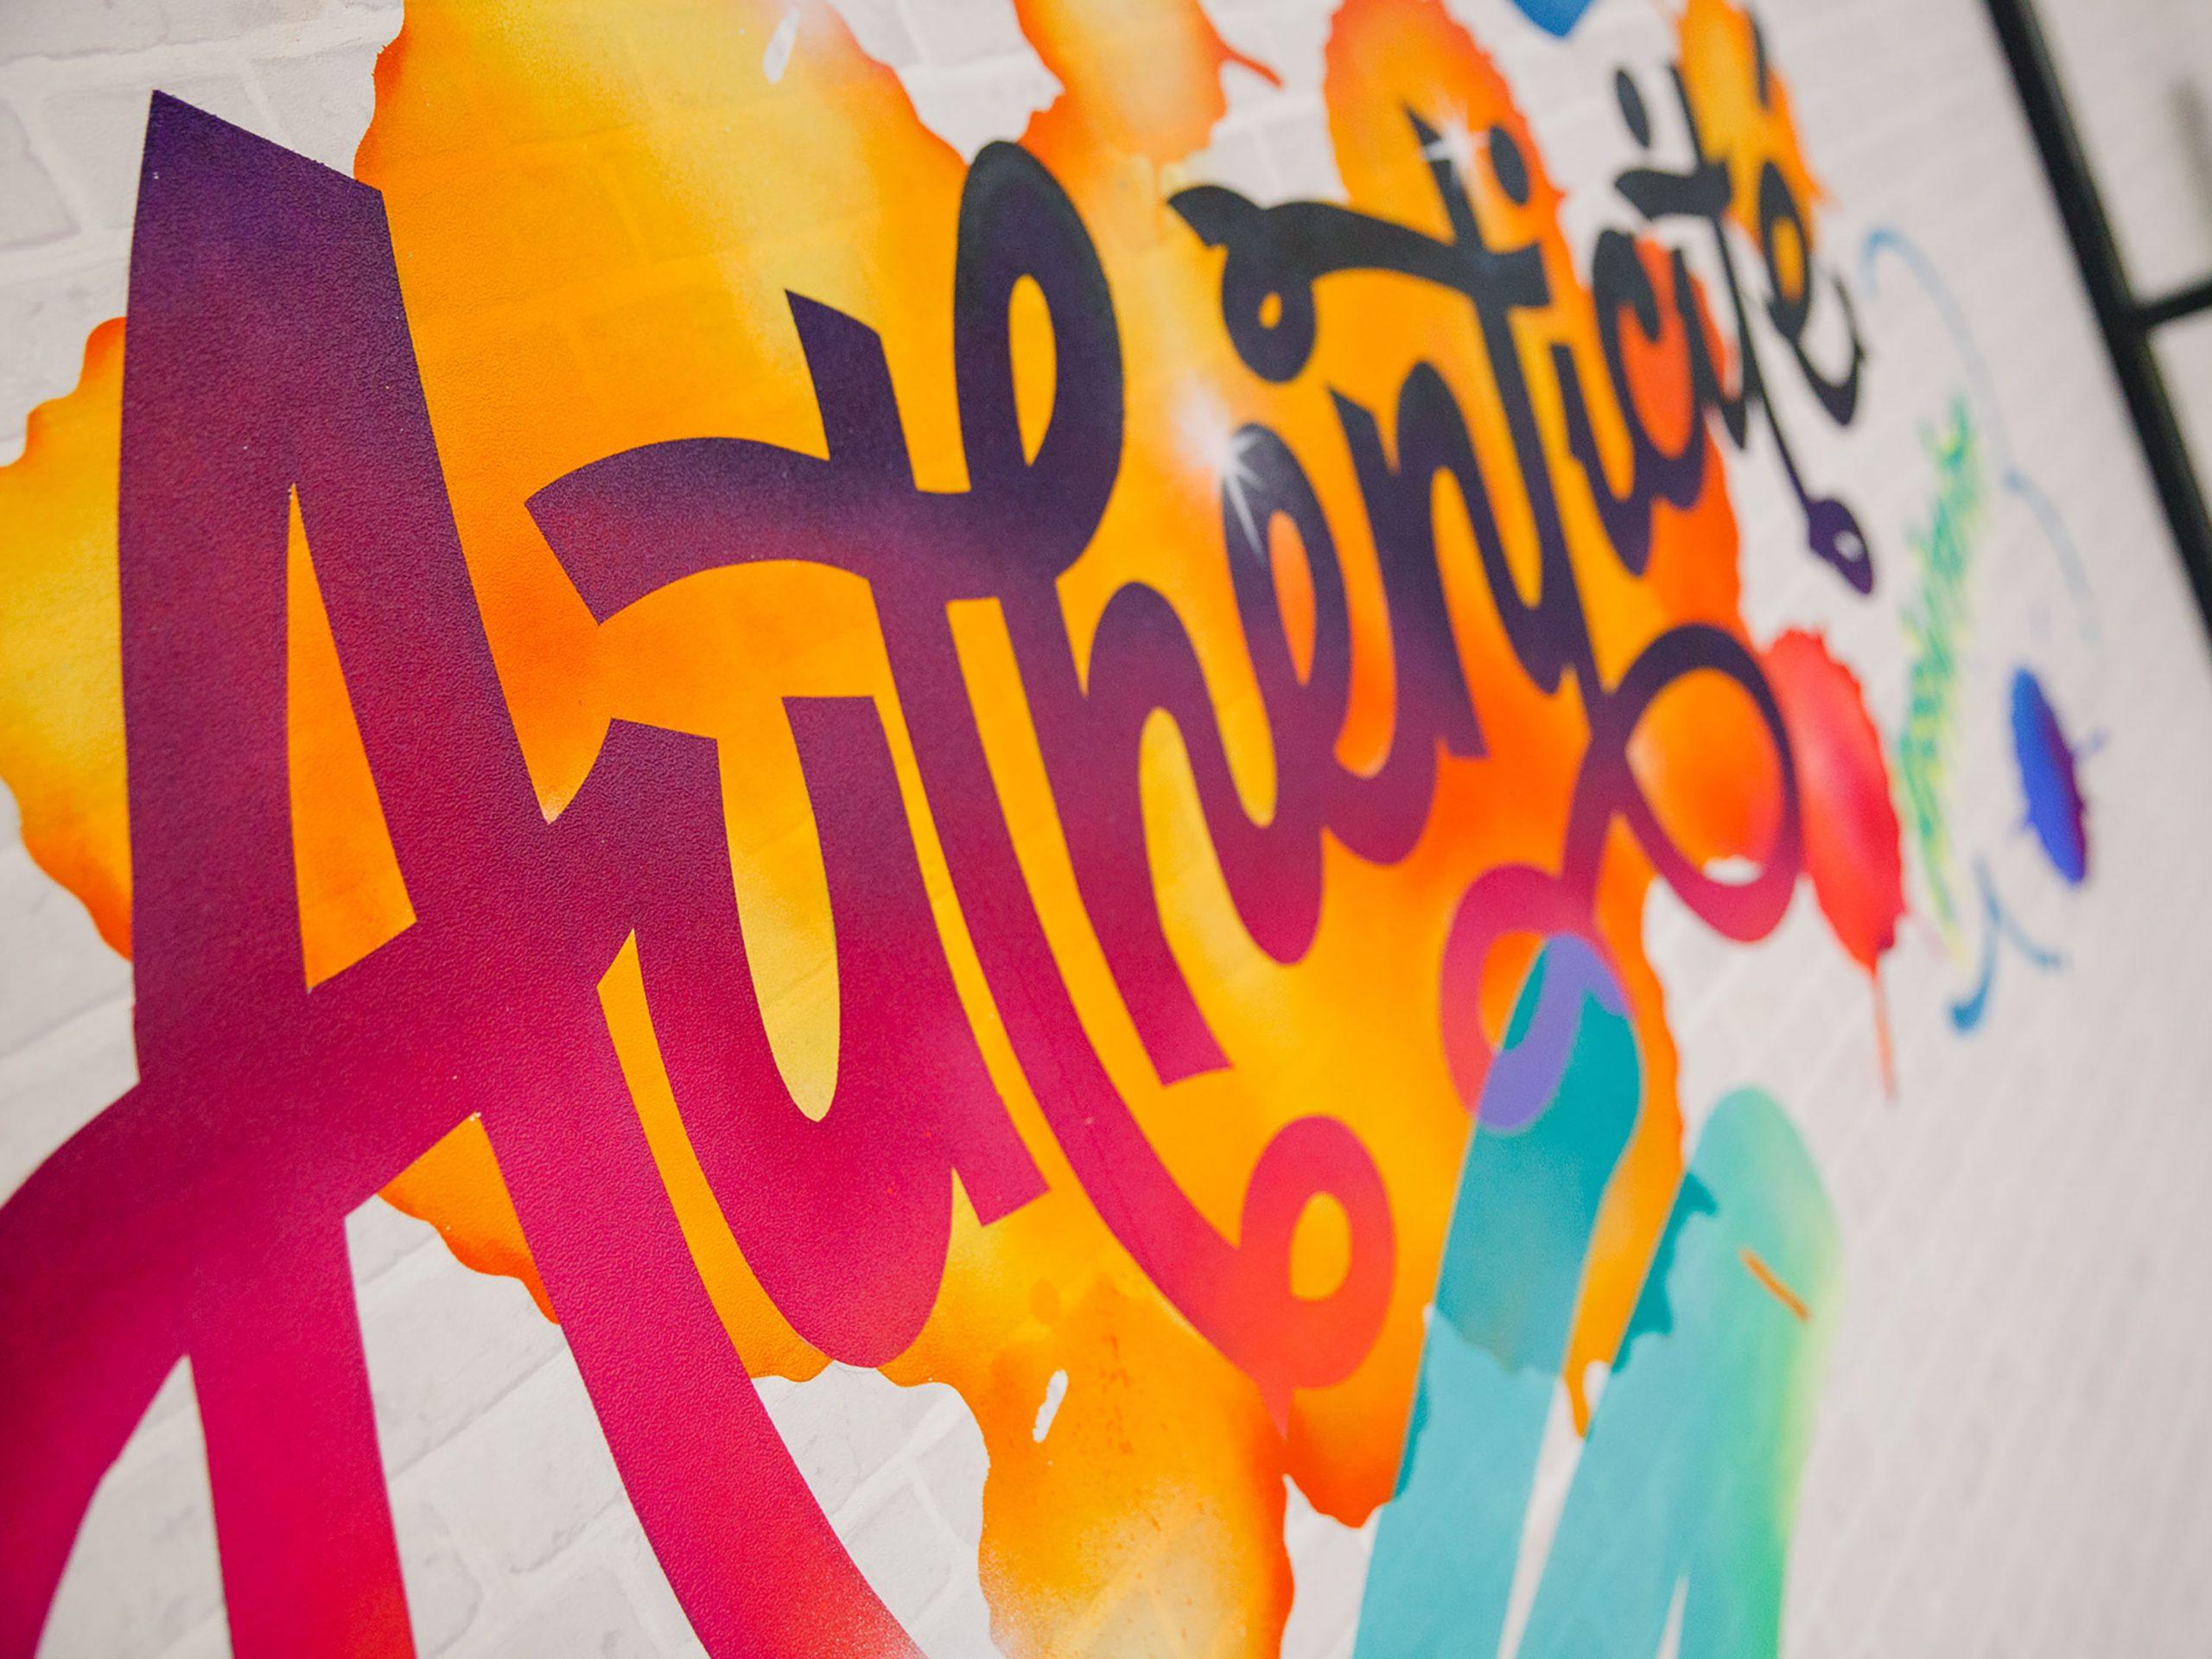 detail-fresque-streetart-graffiti-toulouse-graffeur-artiste-agence-communication-halltimes